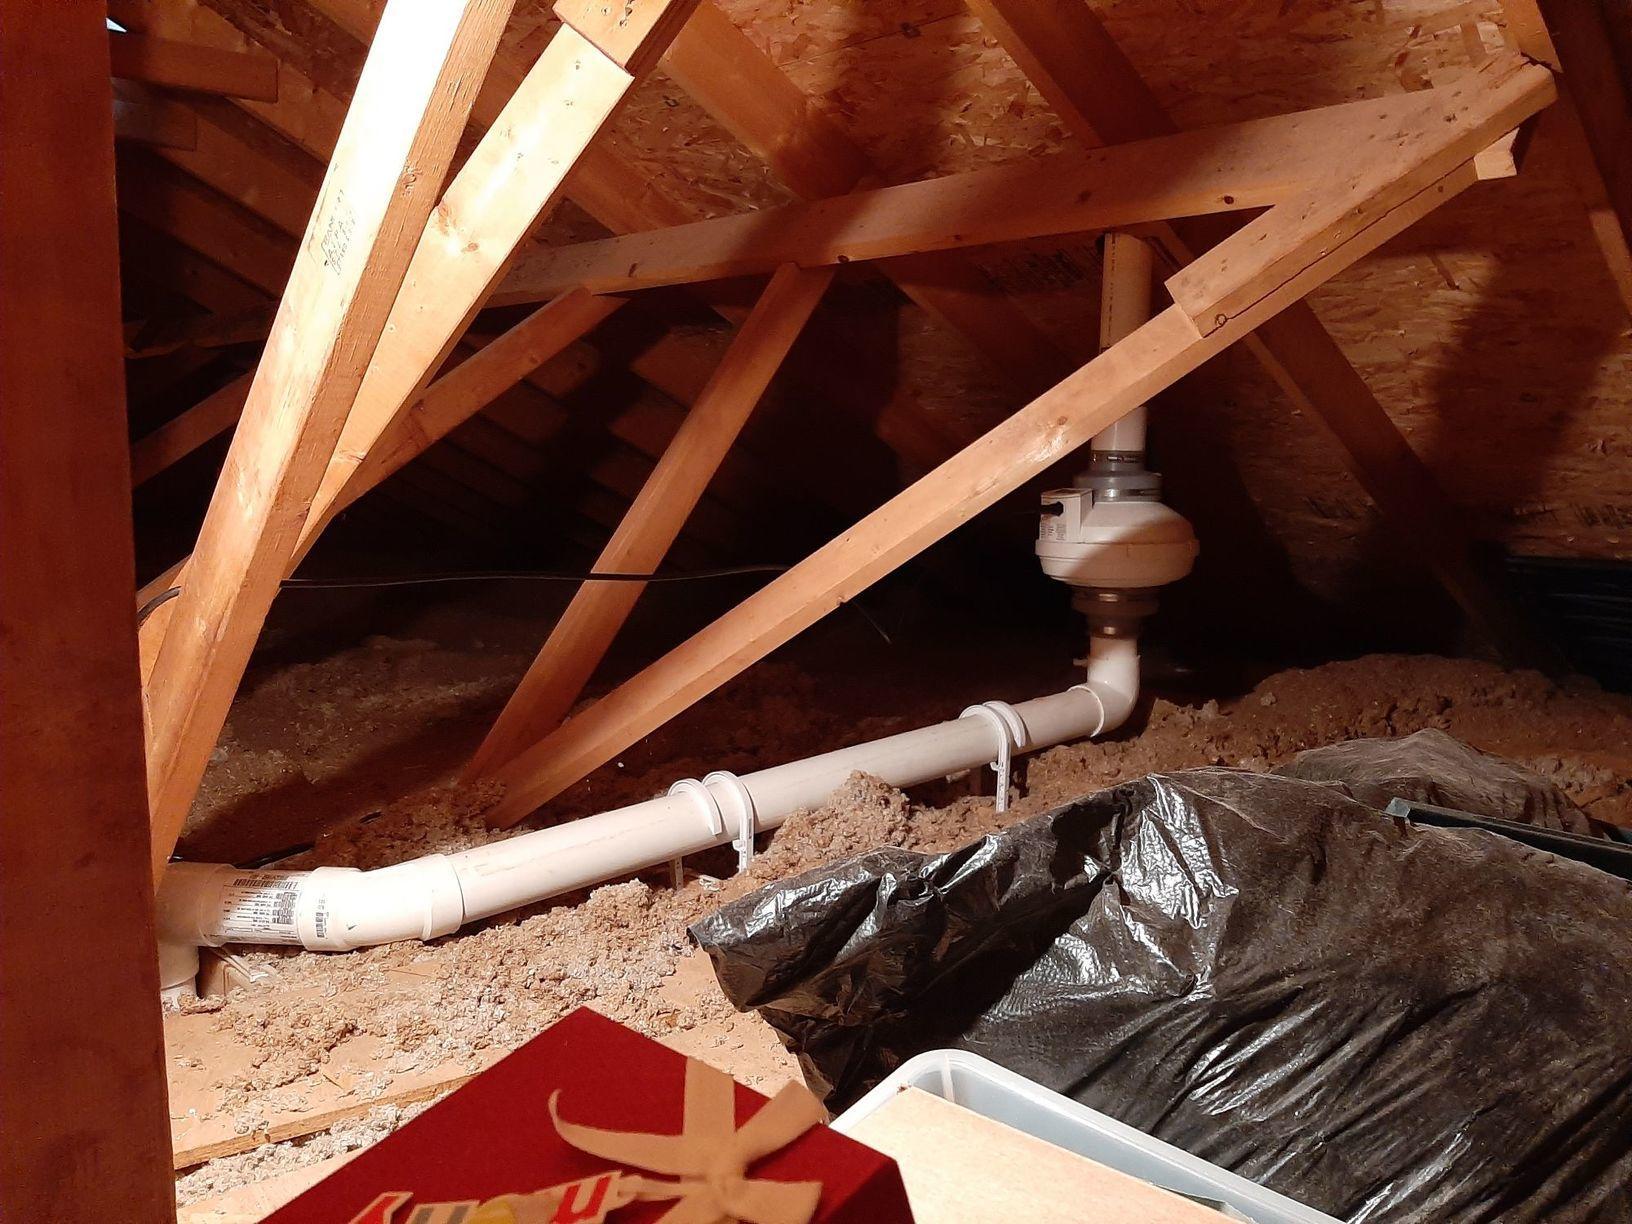 Interior Aesthetic Depressurization Fan in Fort Calhoun, NE